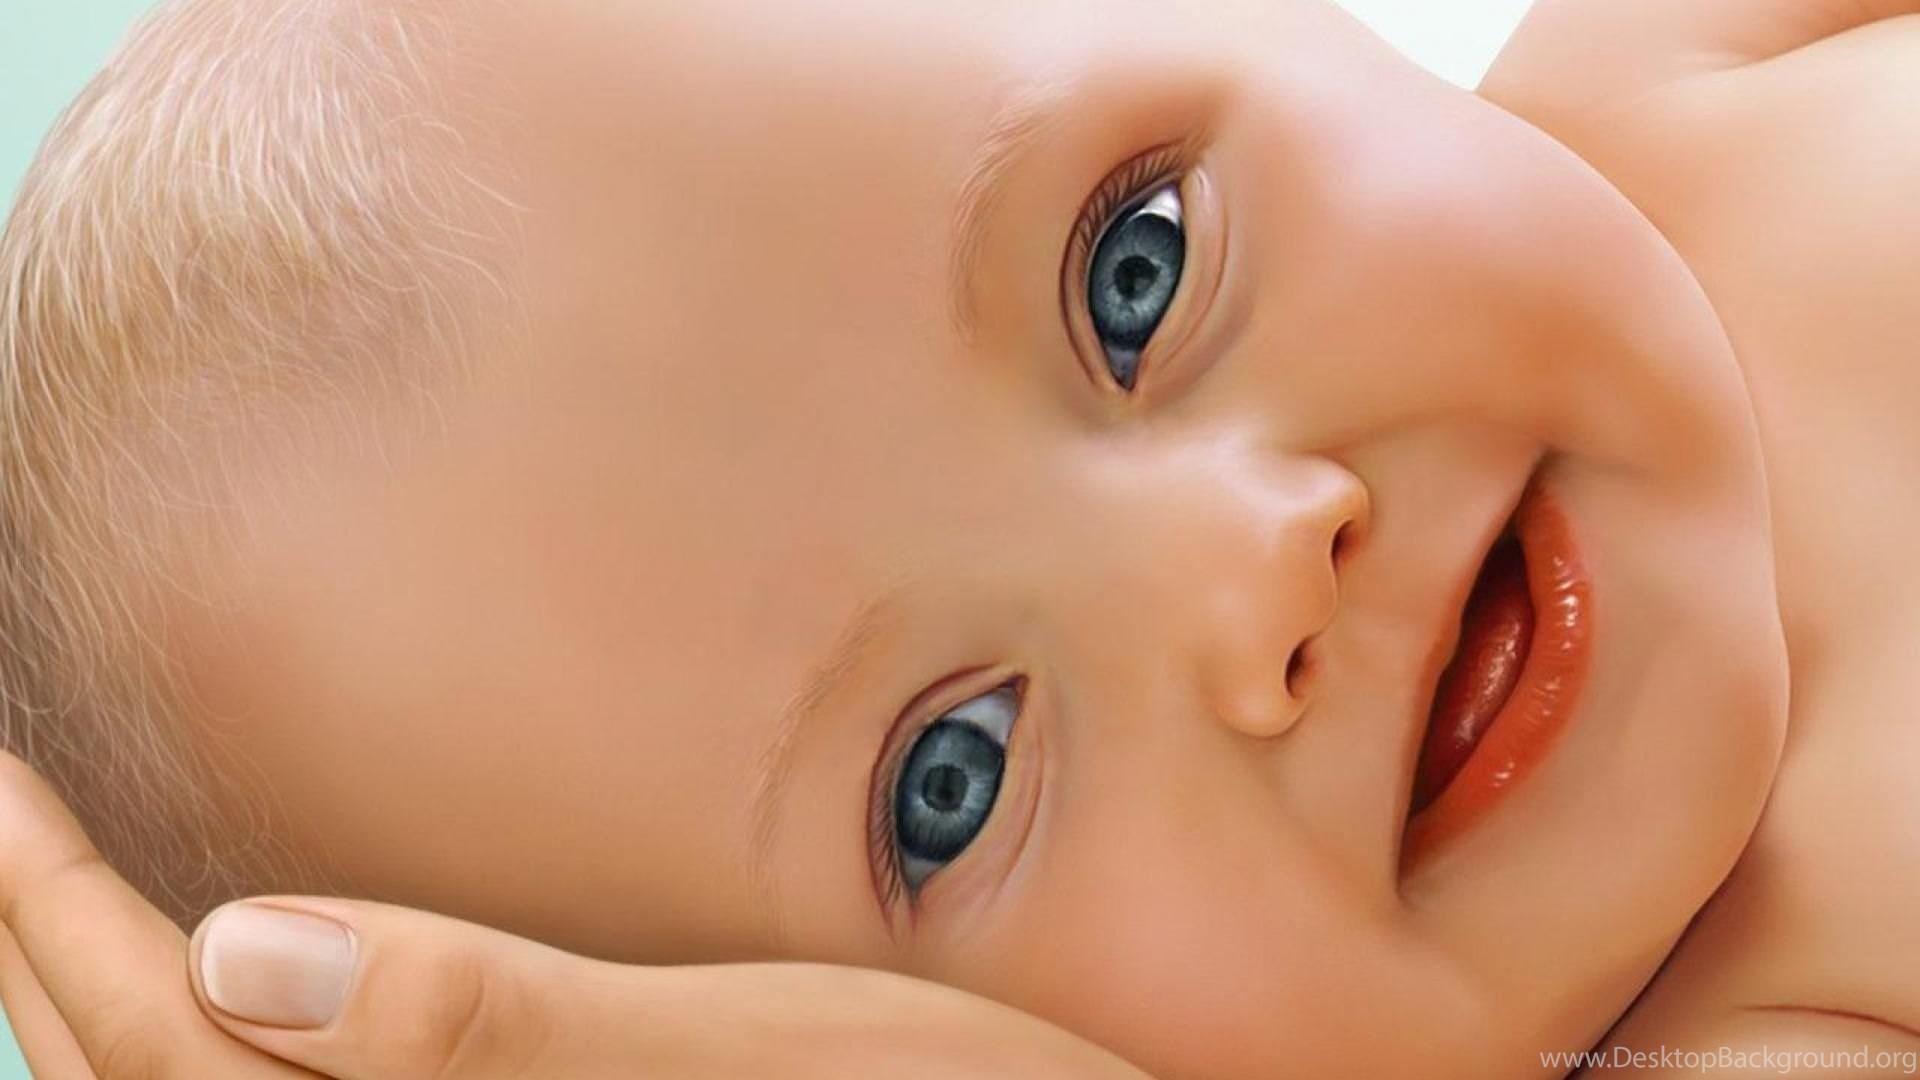 Cute Babies Wallpapers Hd Computer Wallpaper: Cute Newborn Baby Wallpapers HD Free Download Desktop